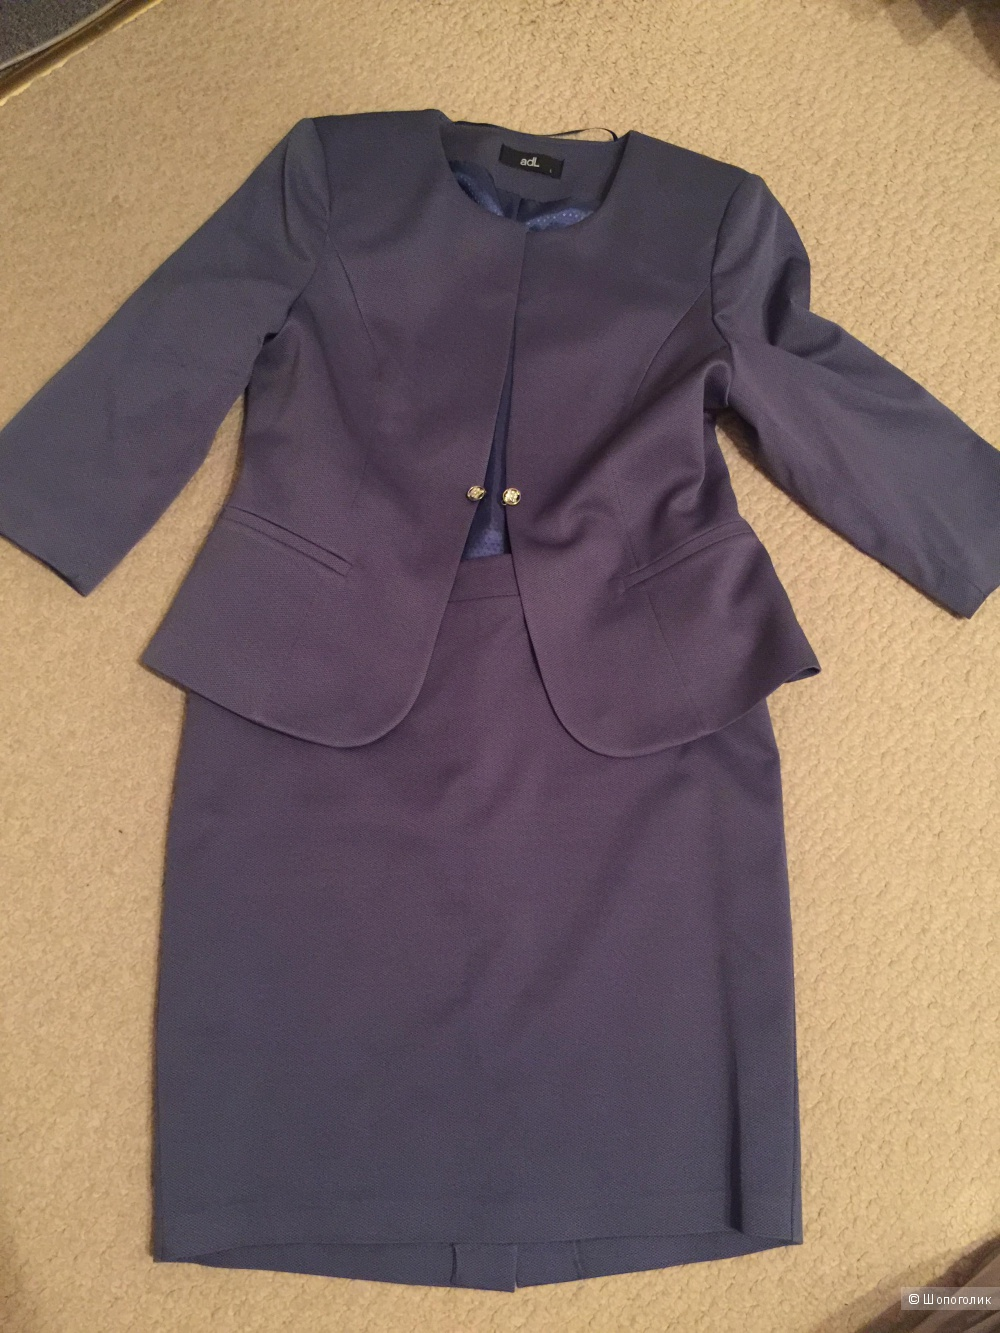 b0d28ec04e6 продаю женский костюм ADL